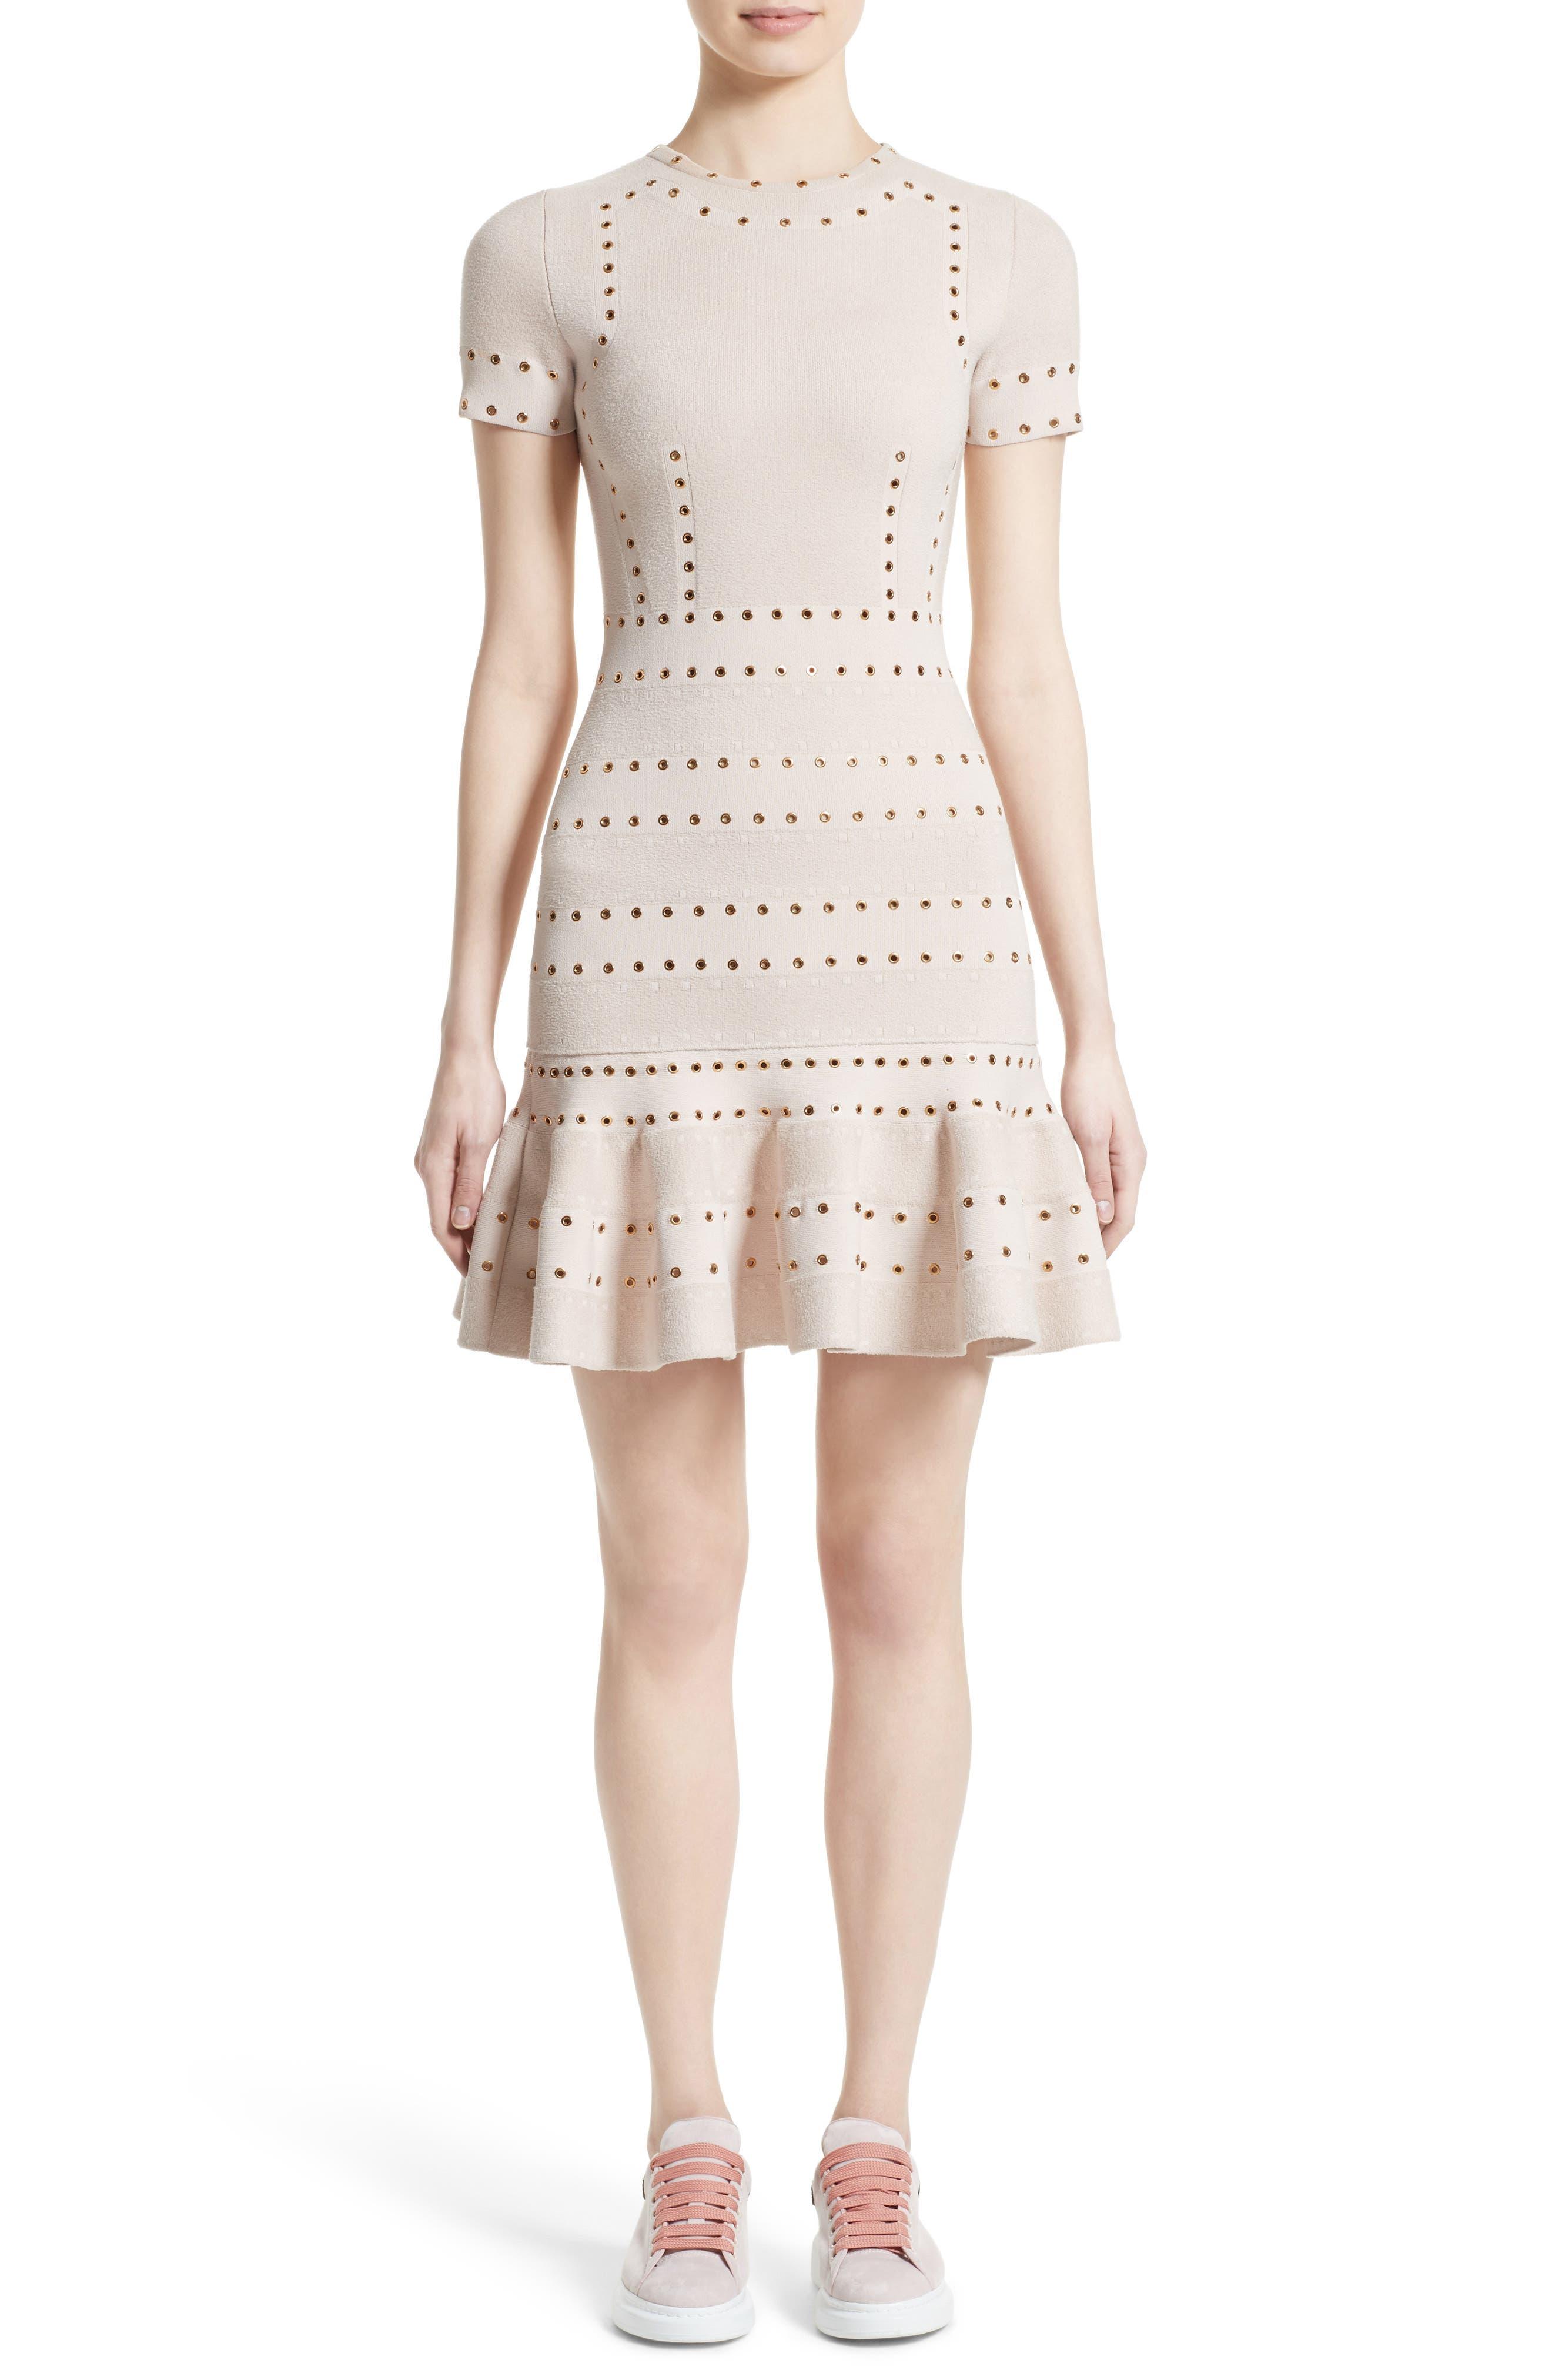 Alternate Image 1 Selected - Alexander McQueen Eyelet Detail Knit Dress